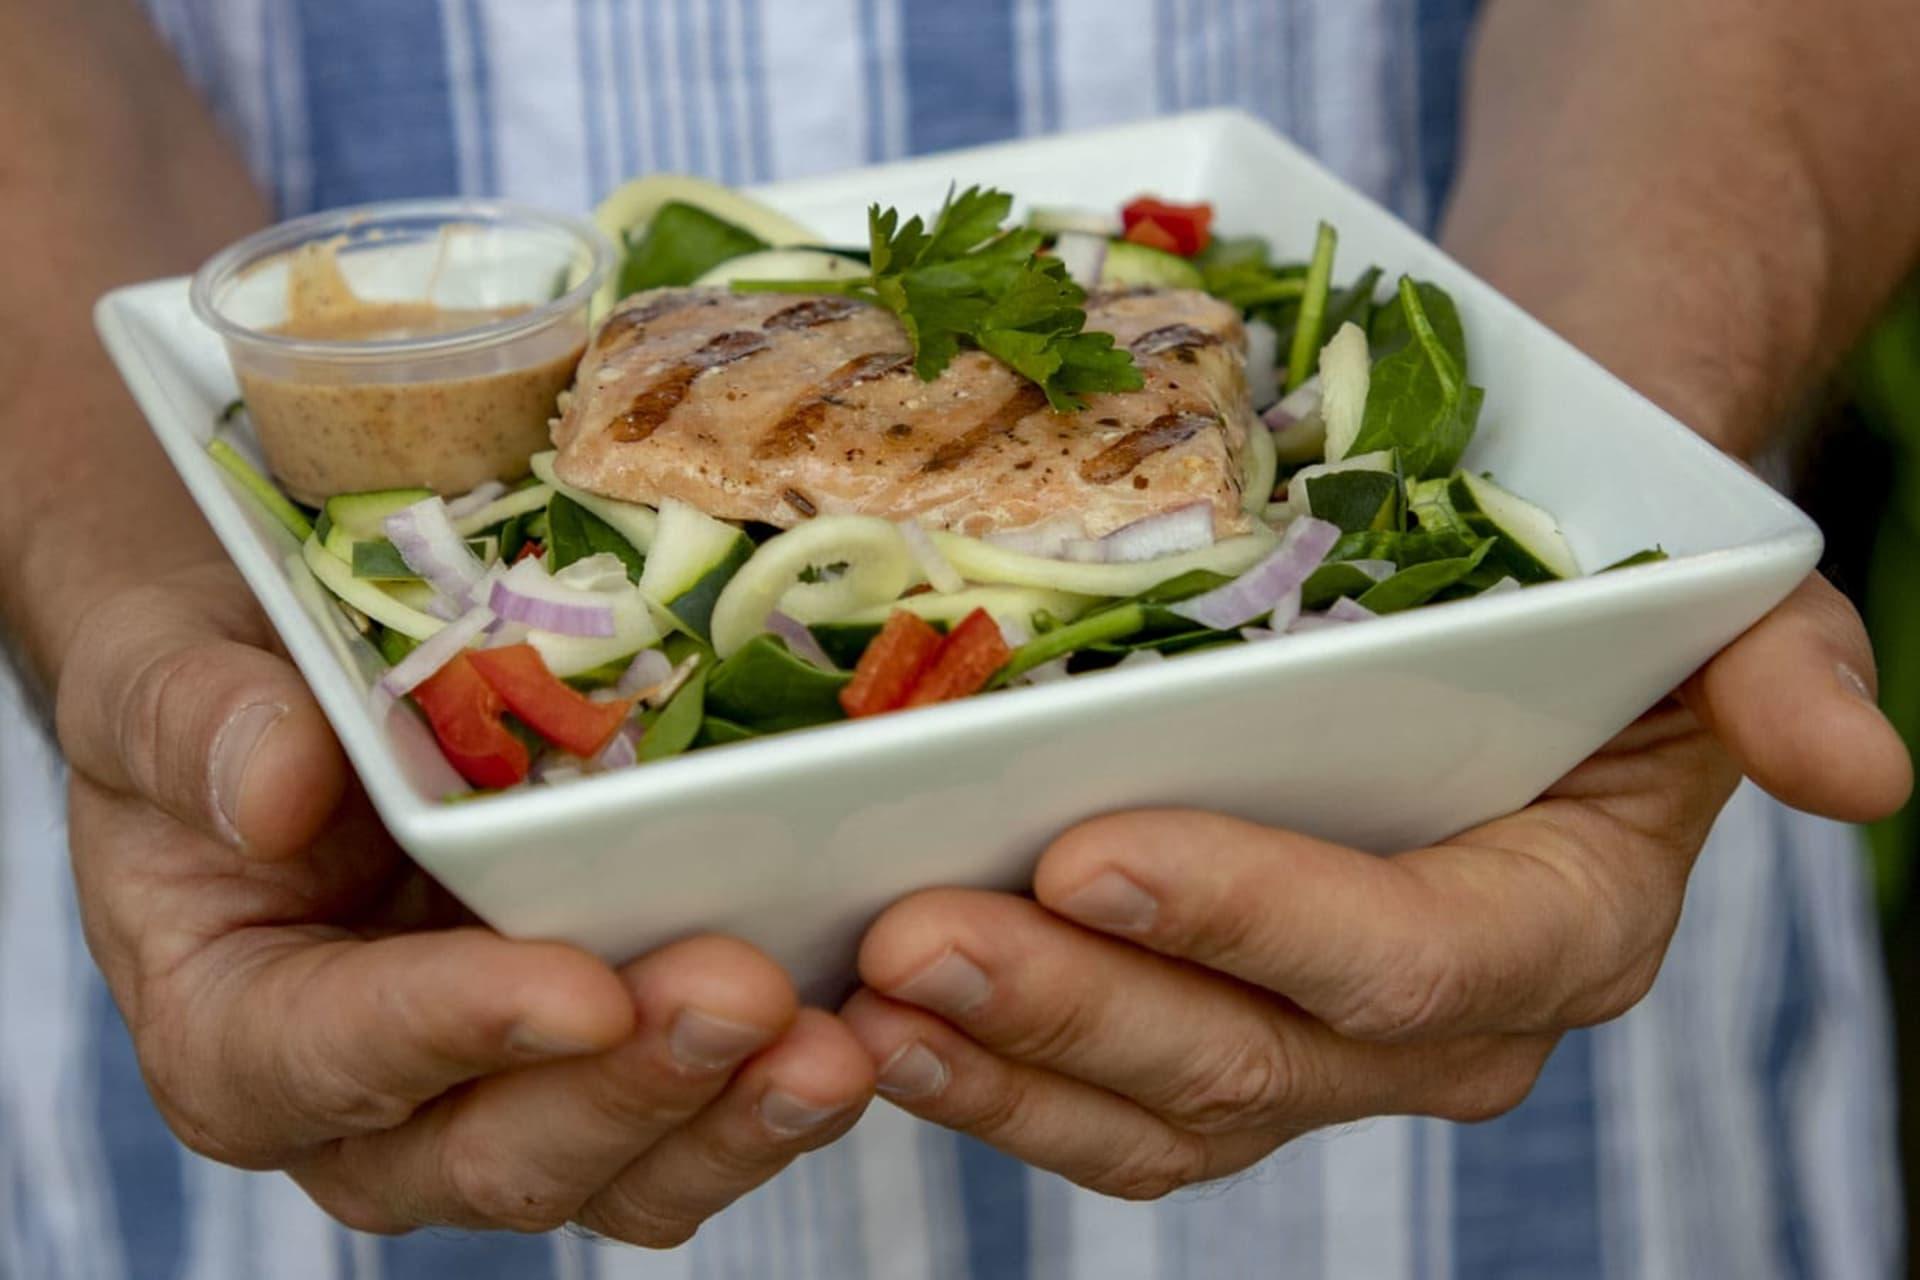 holding salad